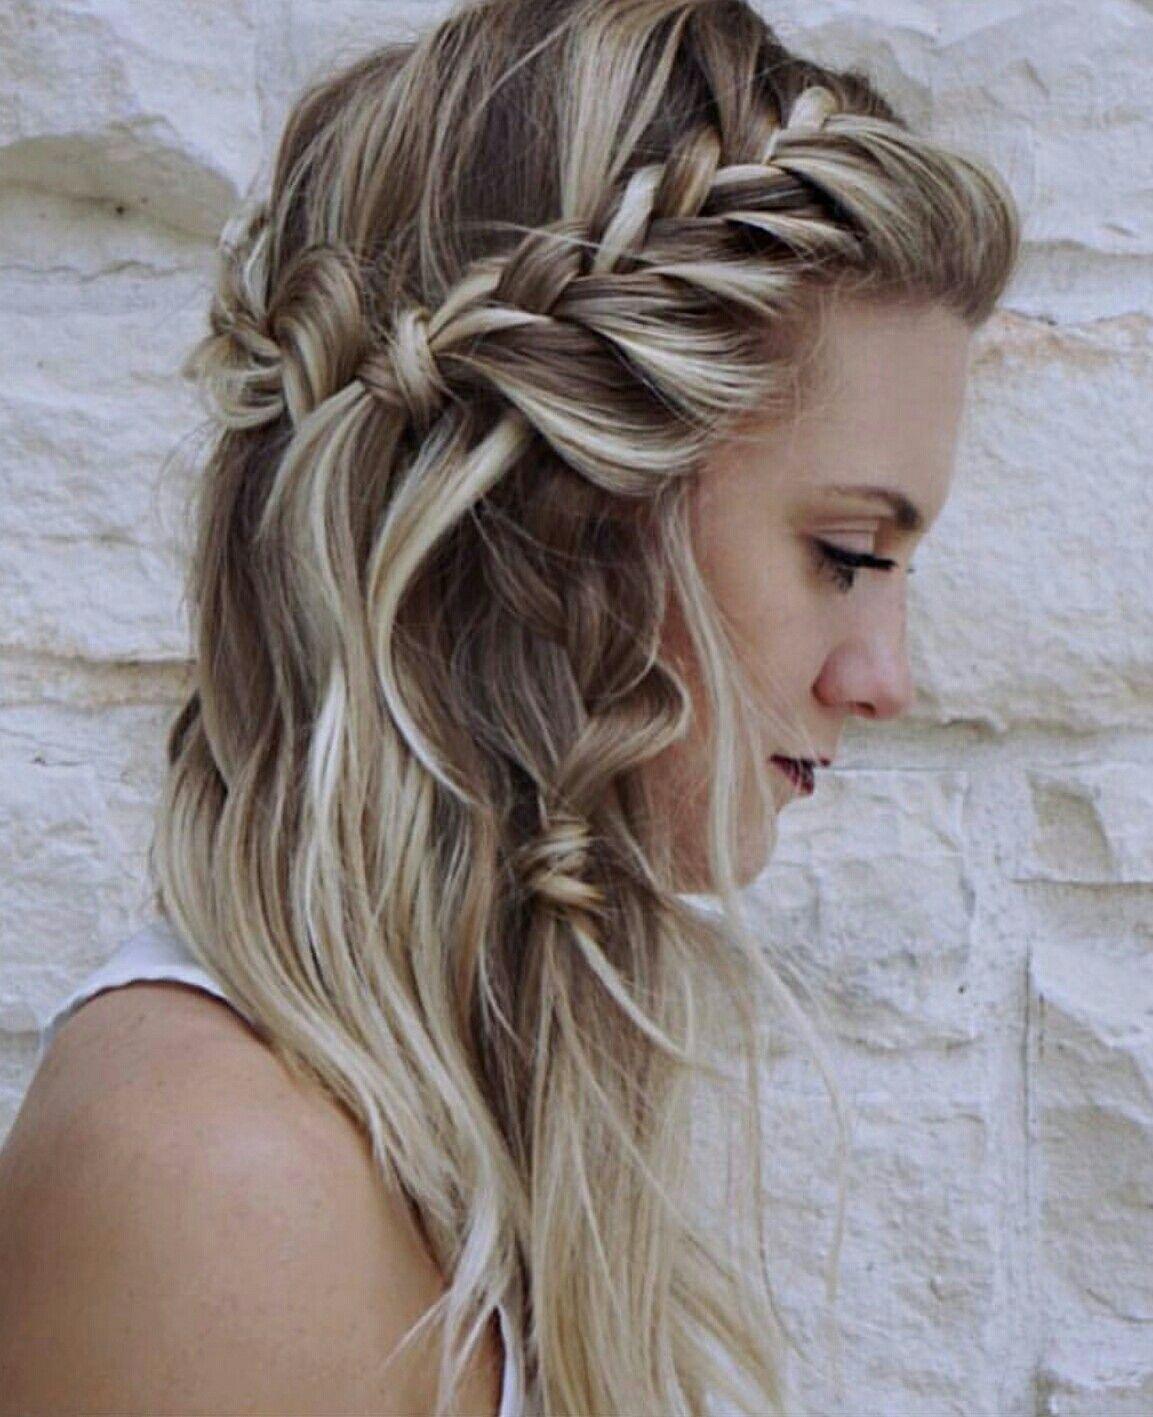 Balayage and boho braids by @hairbyjessica_